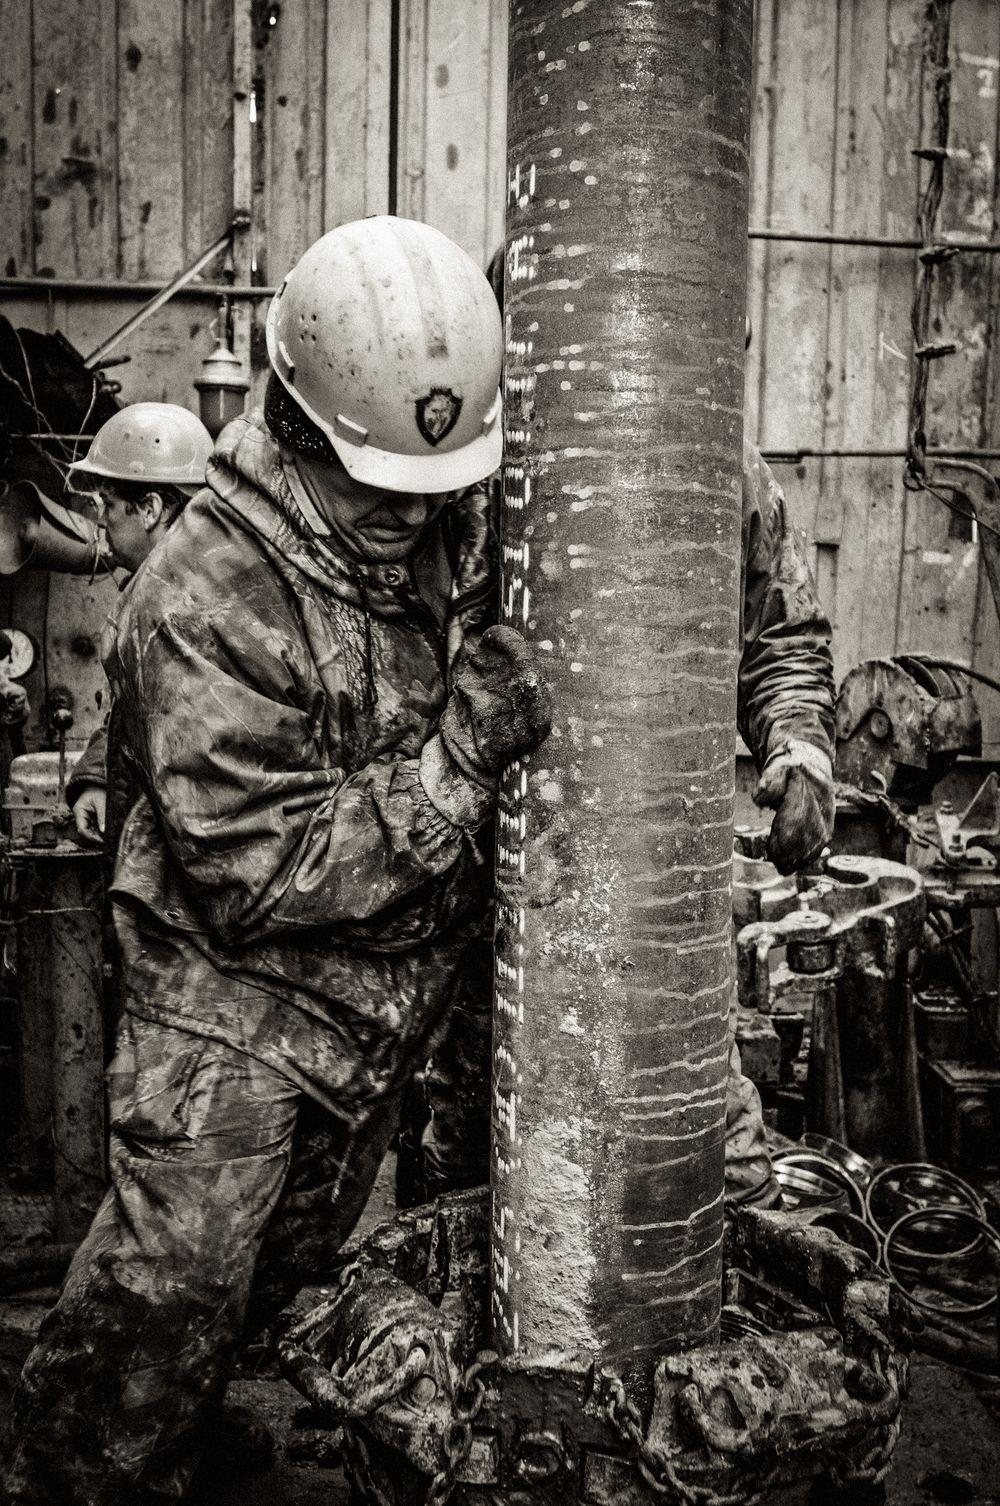 gasprom.russia_20 copy.jpg